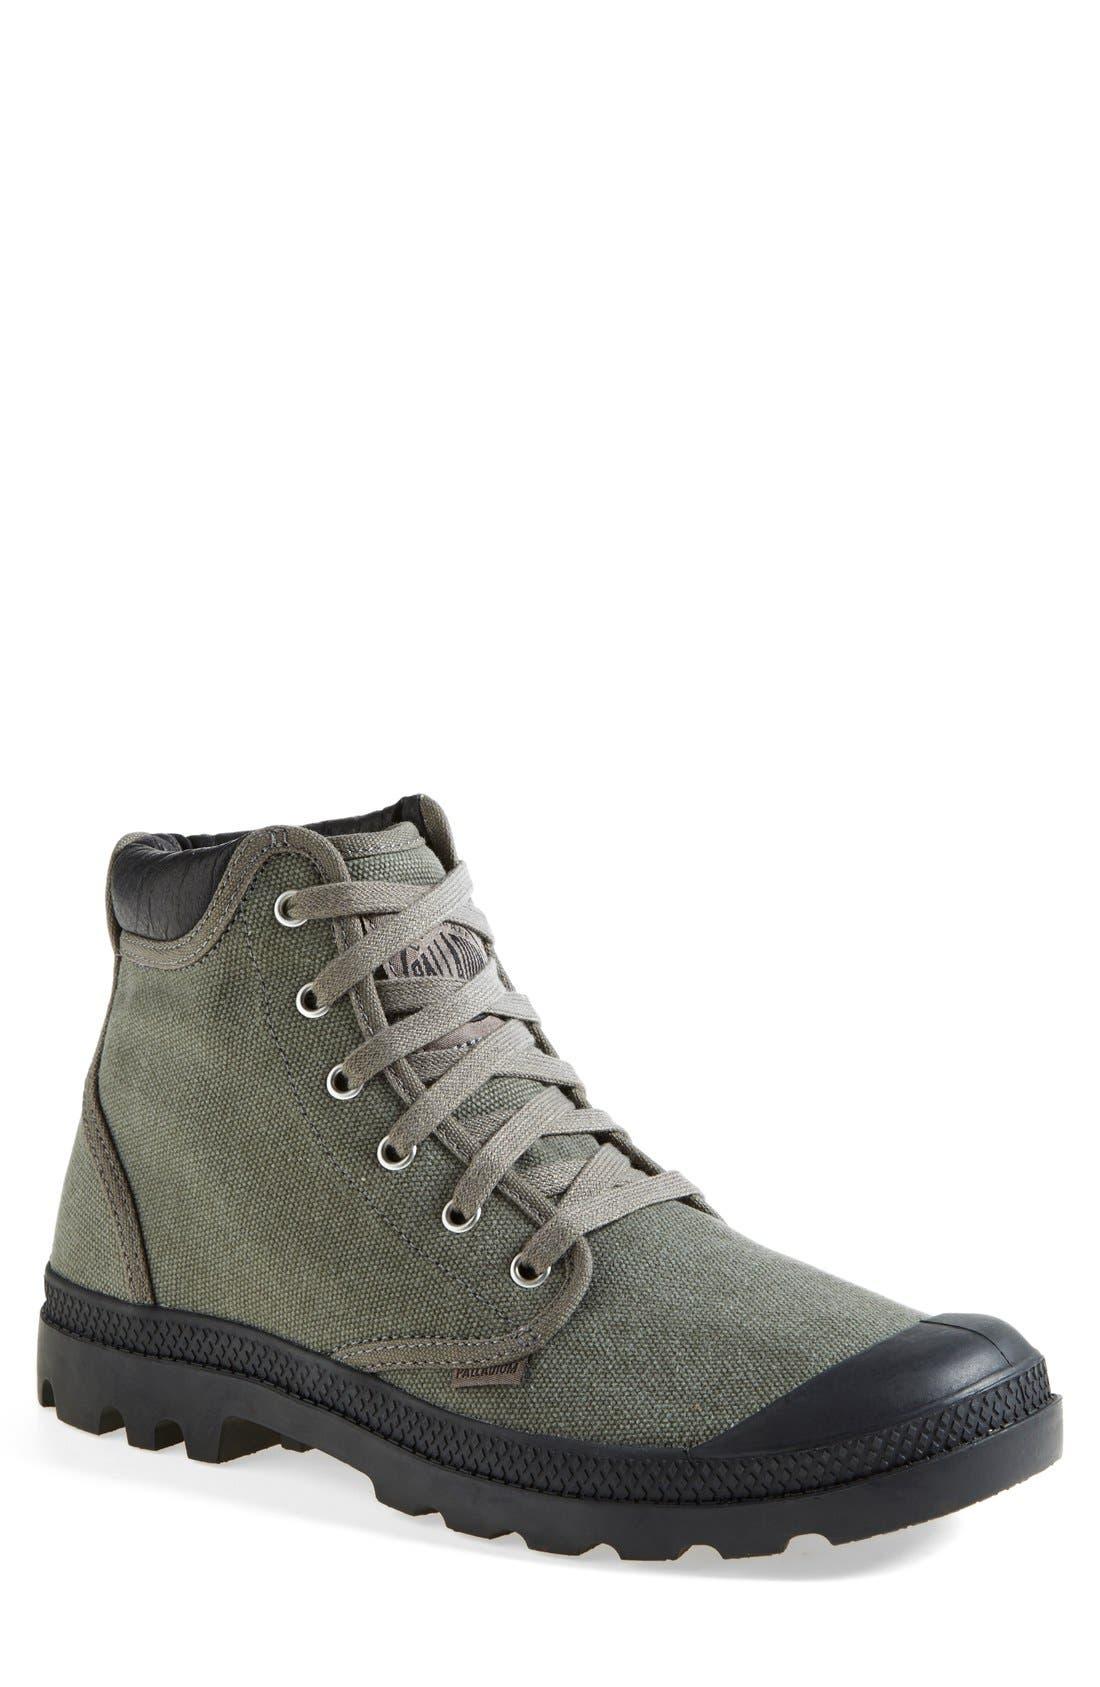 Alternate Image 1 Selected - Palladium 'Pampa Hi' Boot